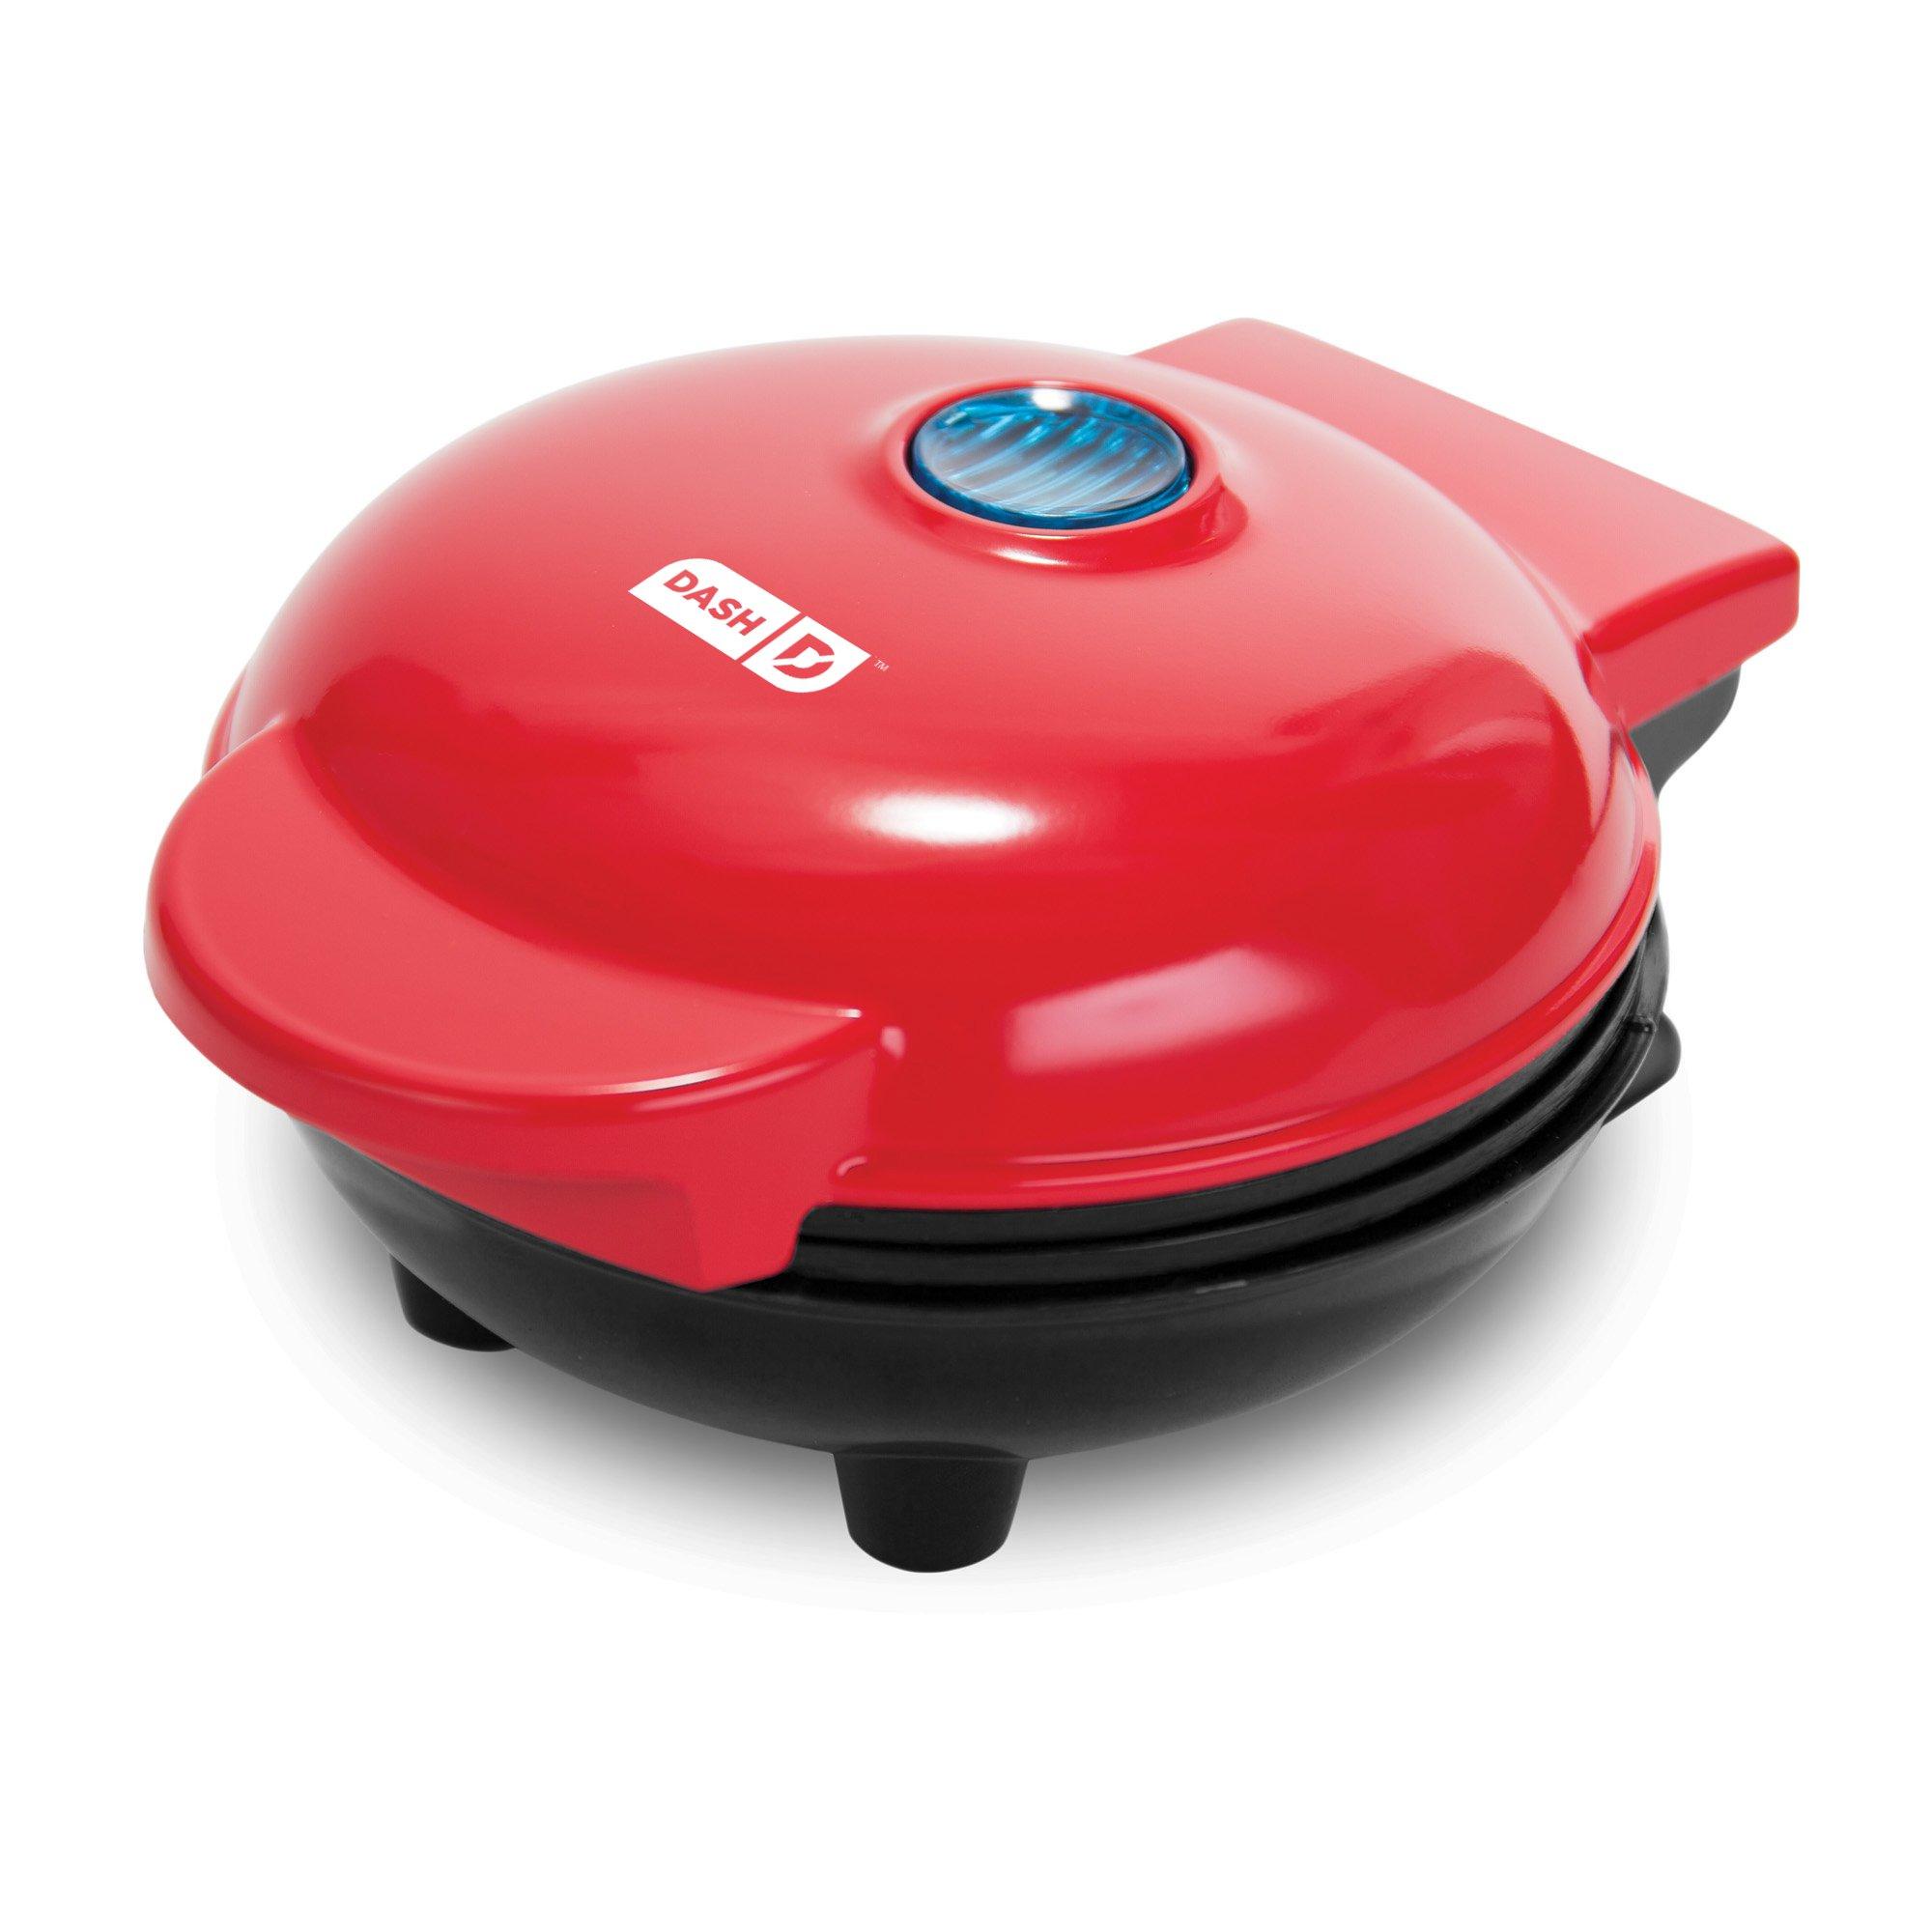 Dash DMG001RD Mini Maker Grill, Red